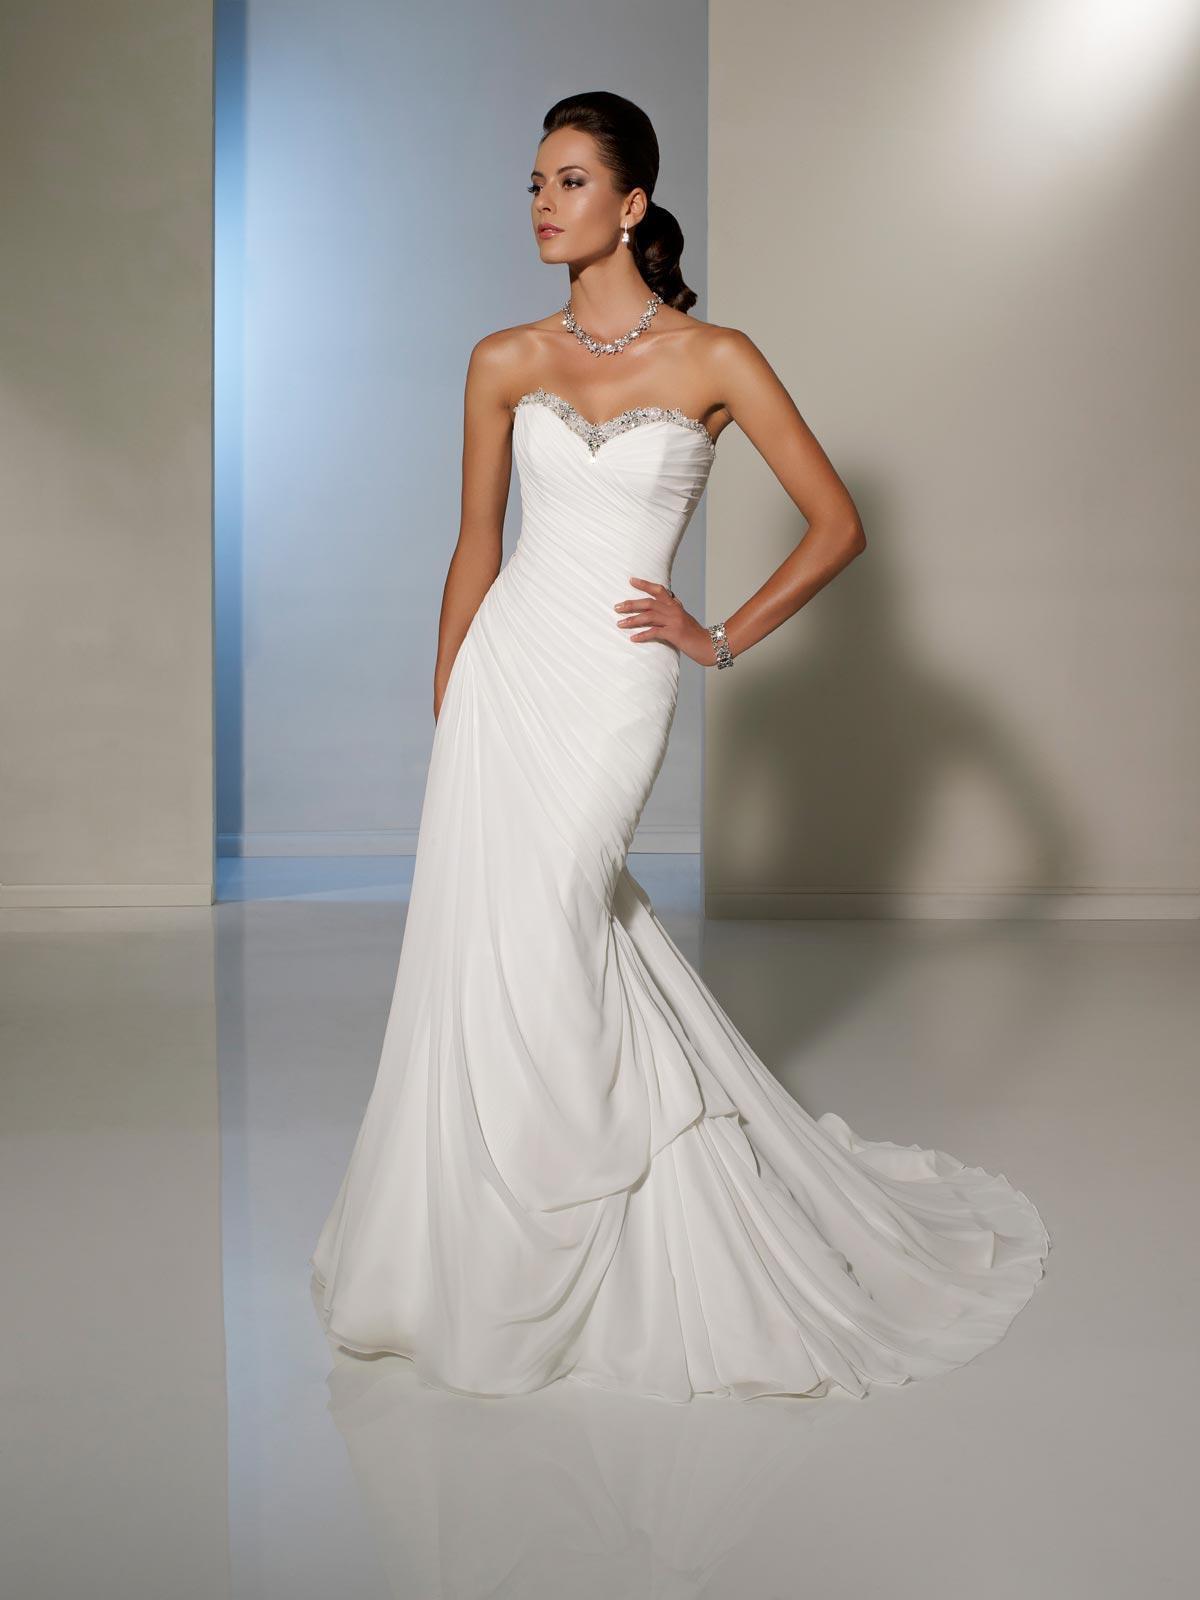 Chic Corset Wedding Gown